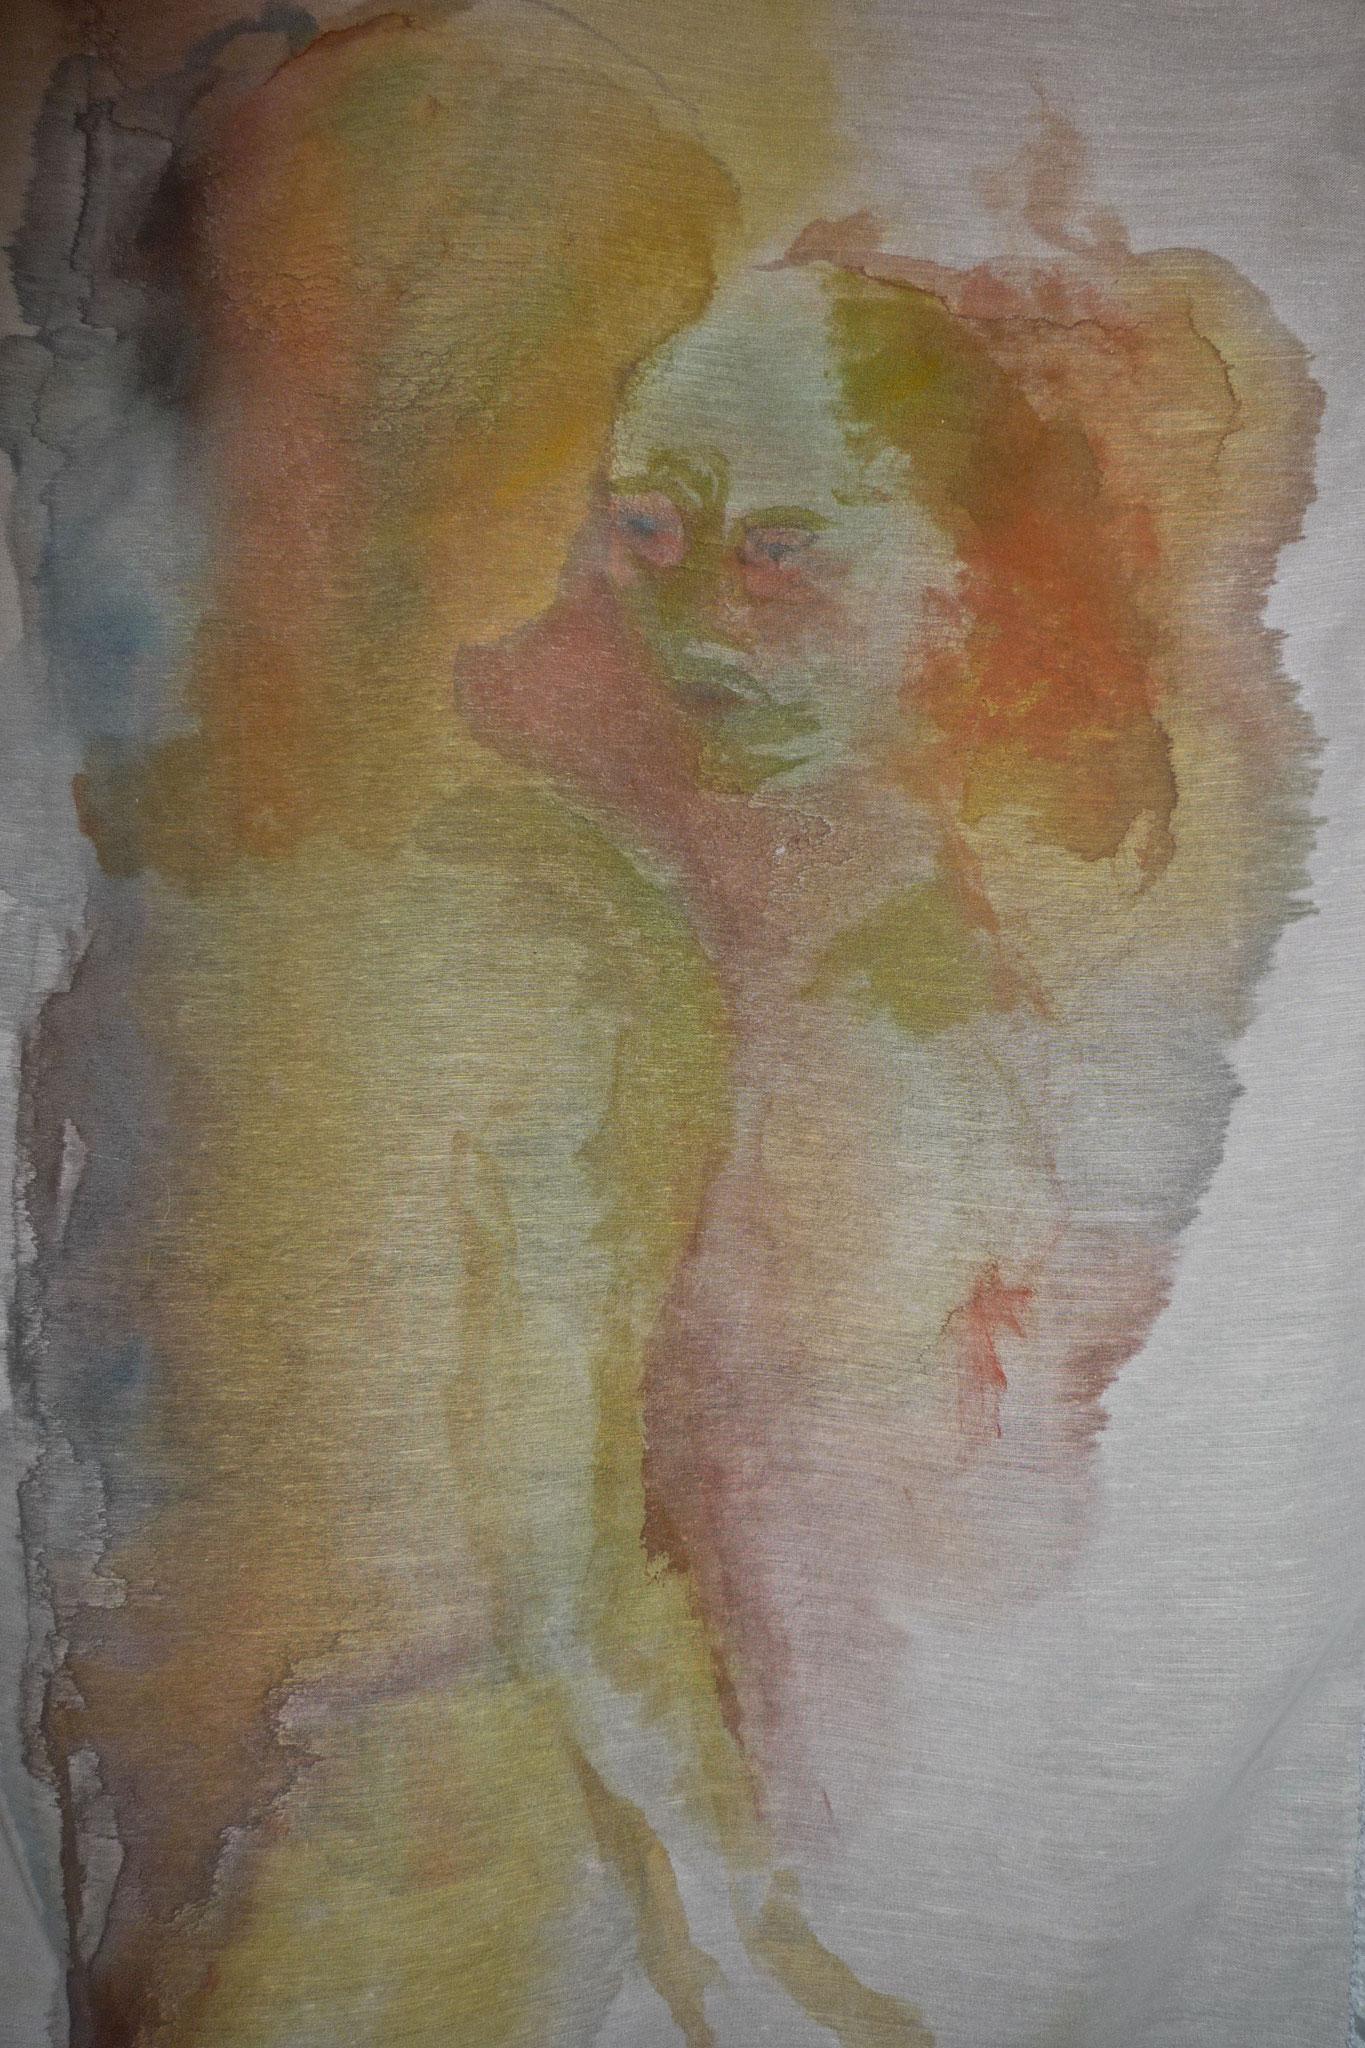 Peinture sur voilage 1,80 x 1,20m